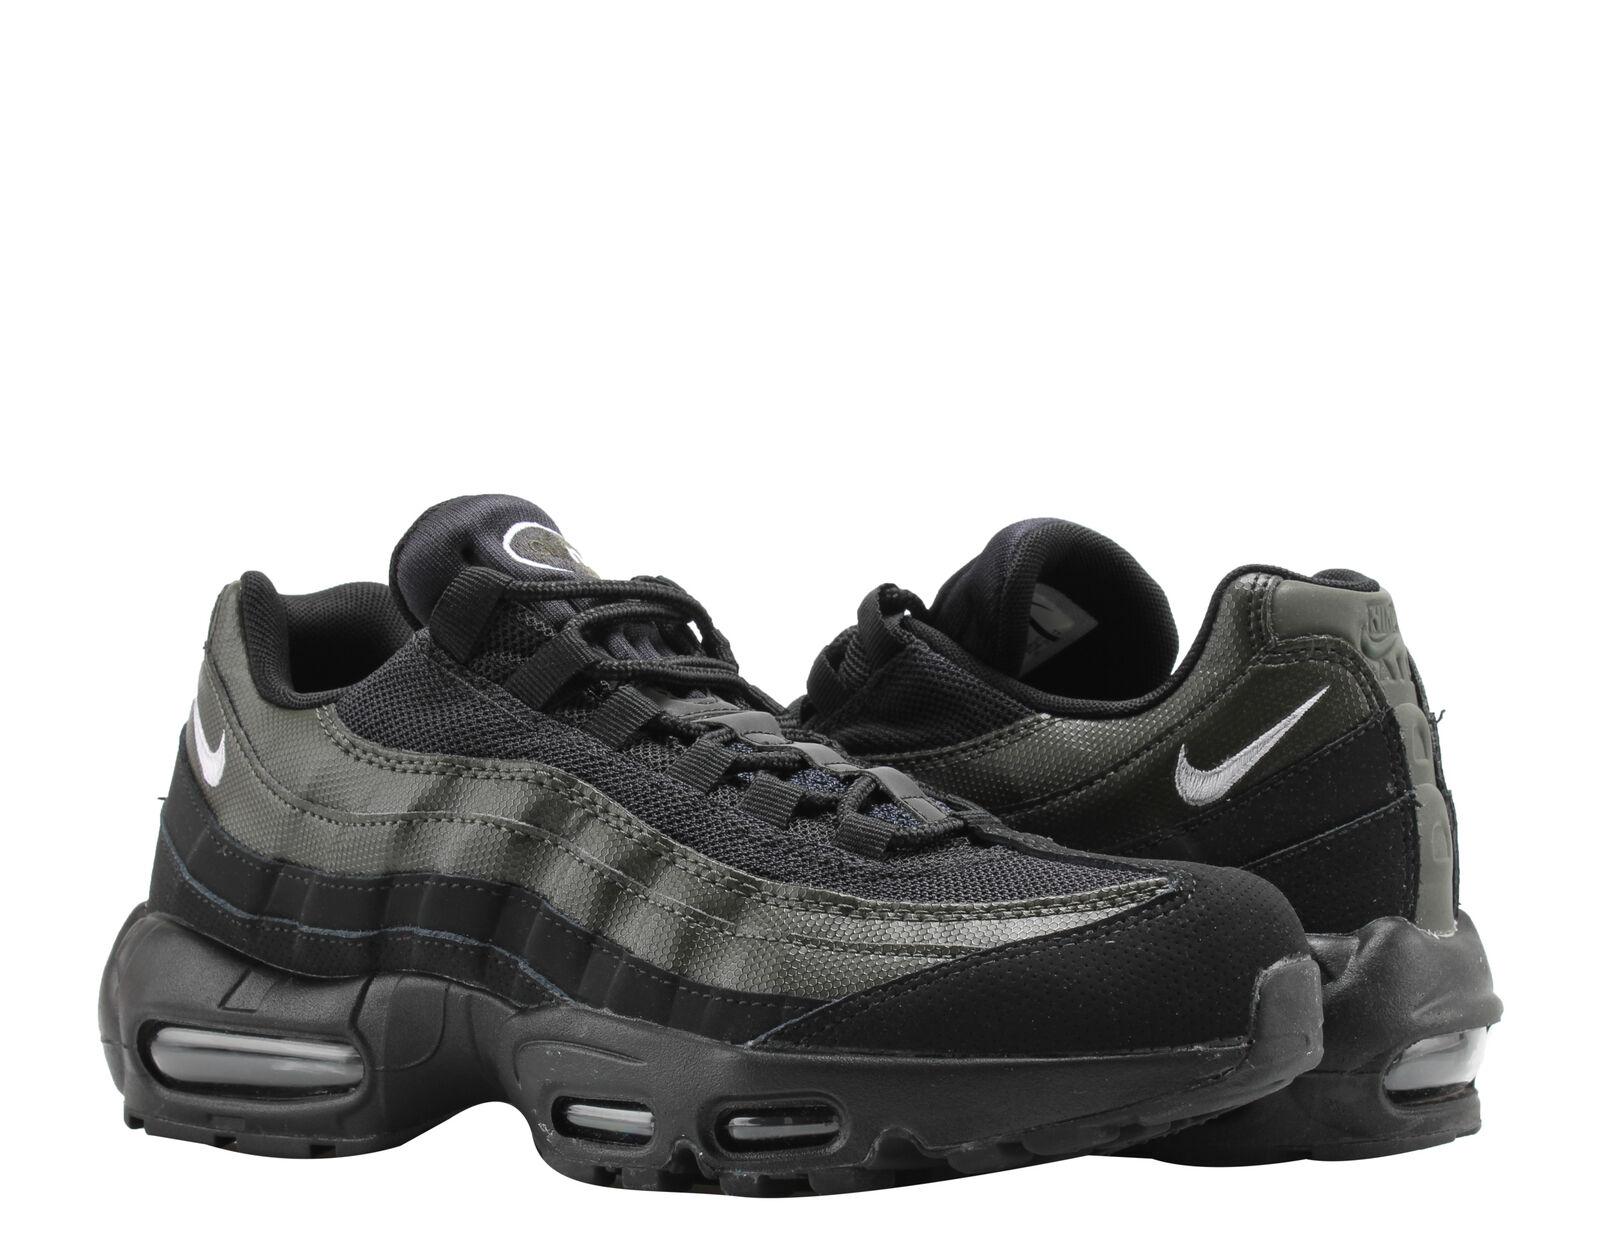 Nike Air Max 95 Essential nero   bianca -Sequoia Men's Running scarpe 749766 -034  per offrirti un piacevole shopping online